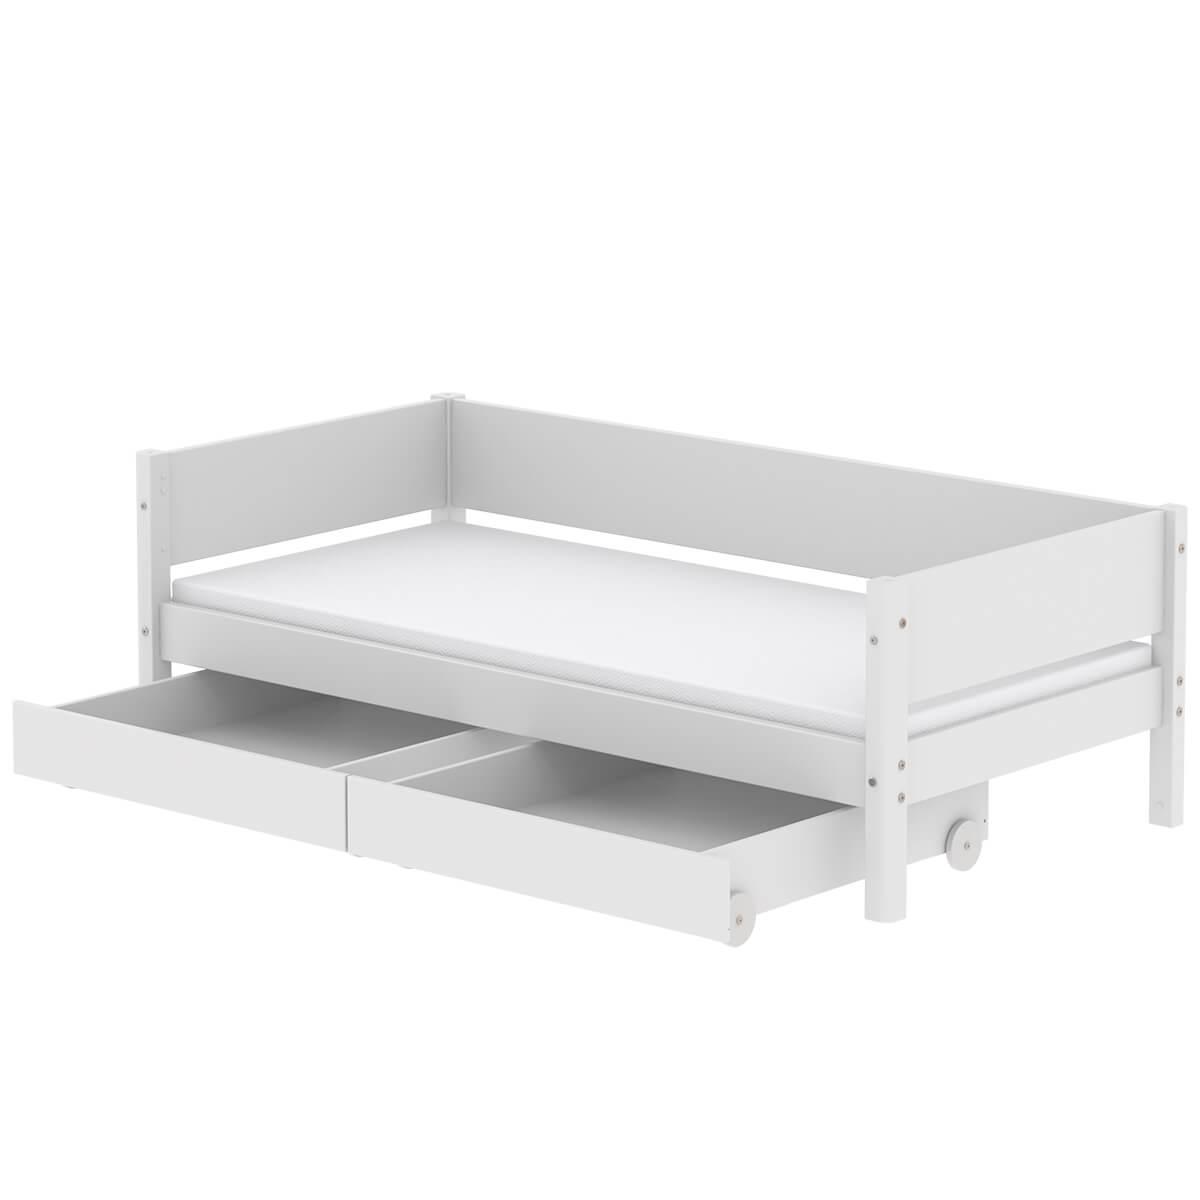 Lit enfant simple 90x200cm 2 tiroirs WHITE Flexa blanc